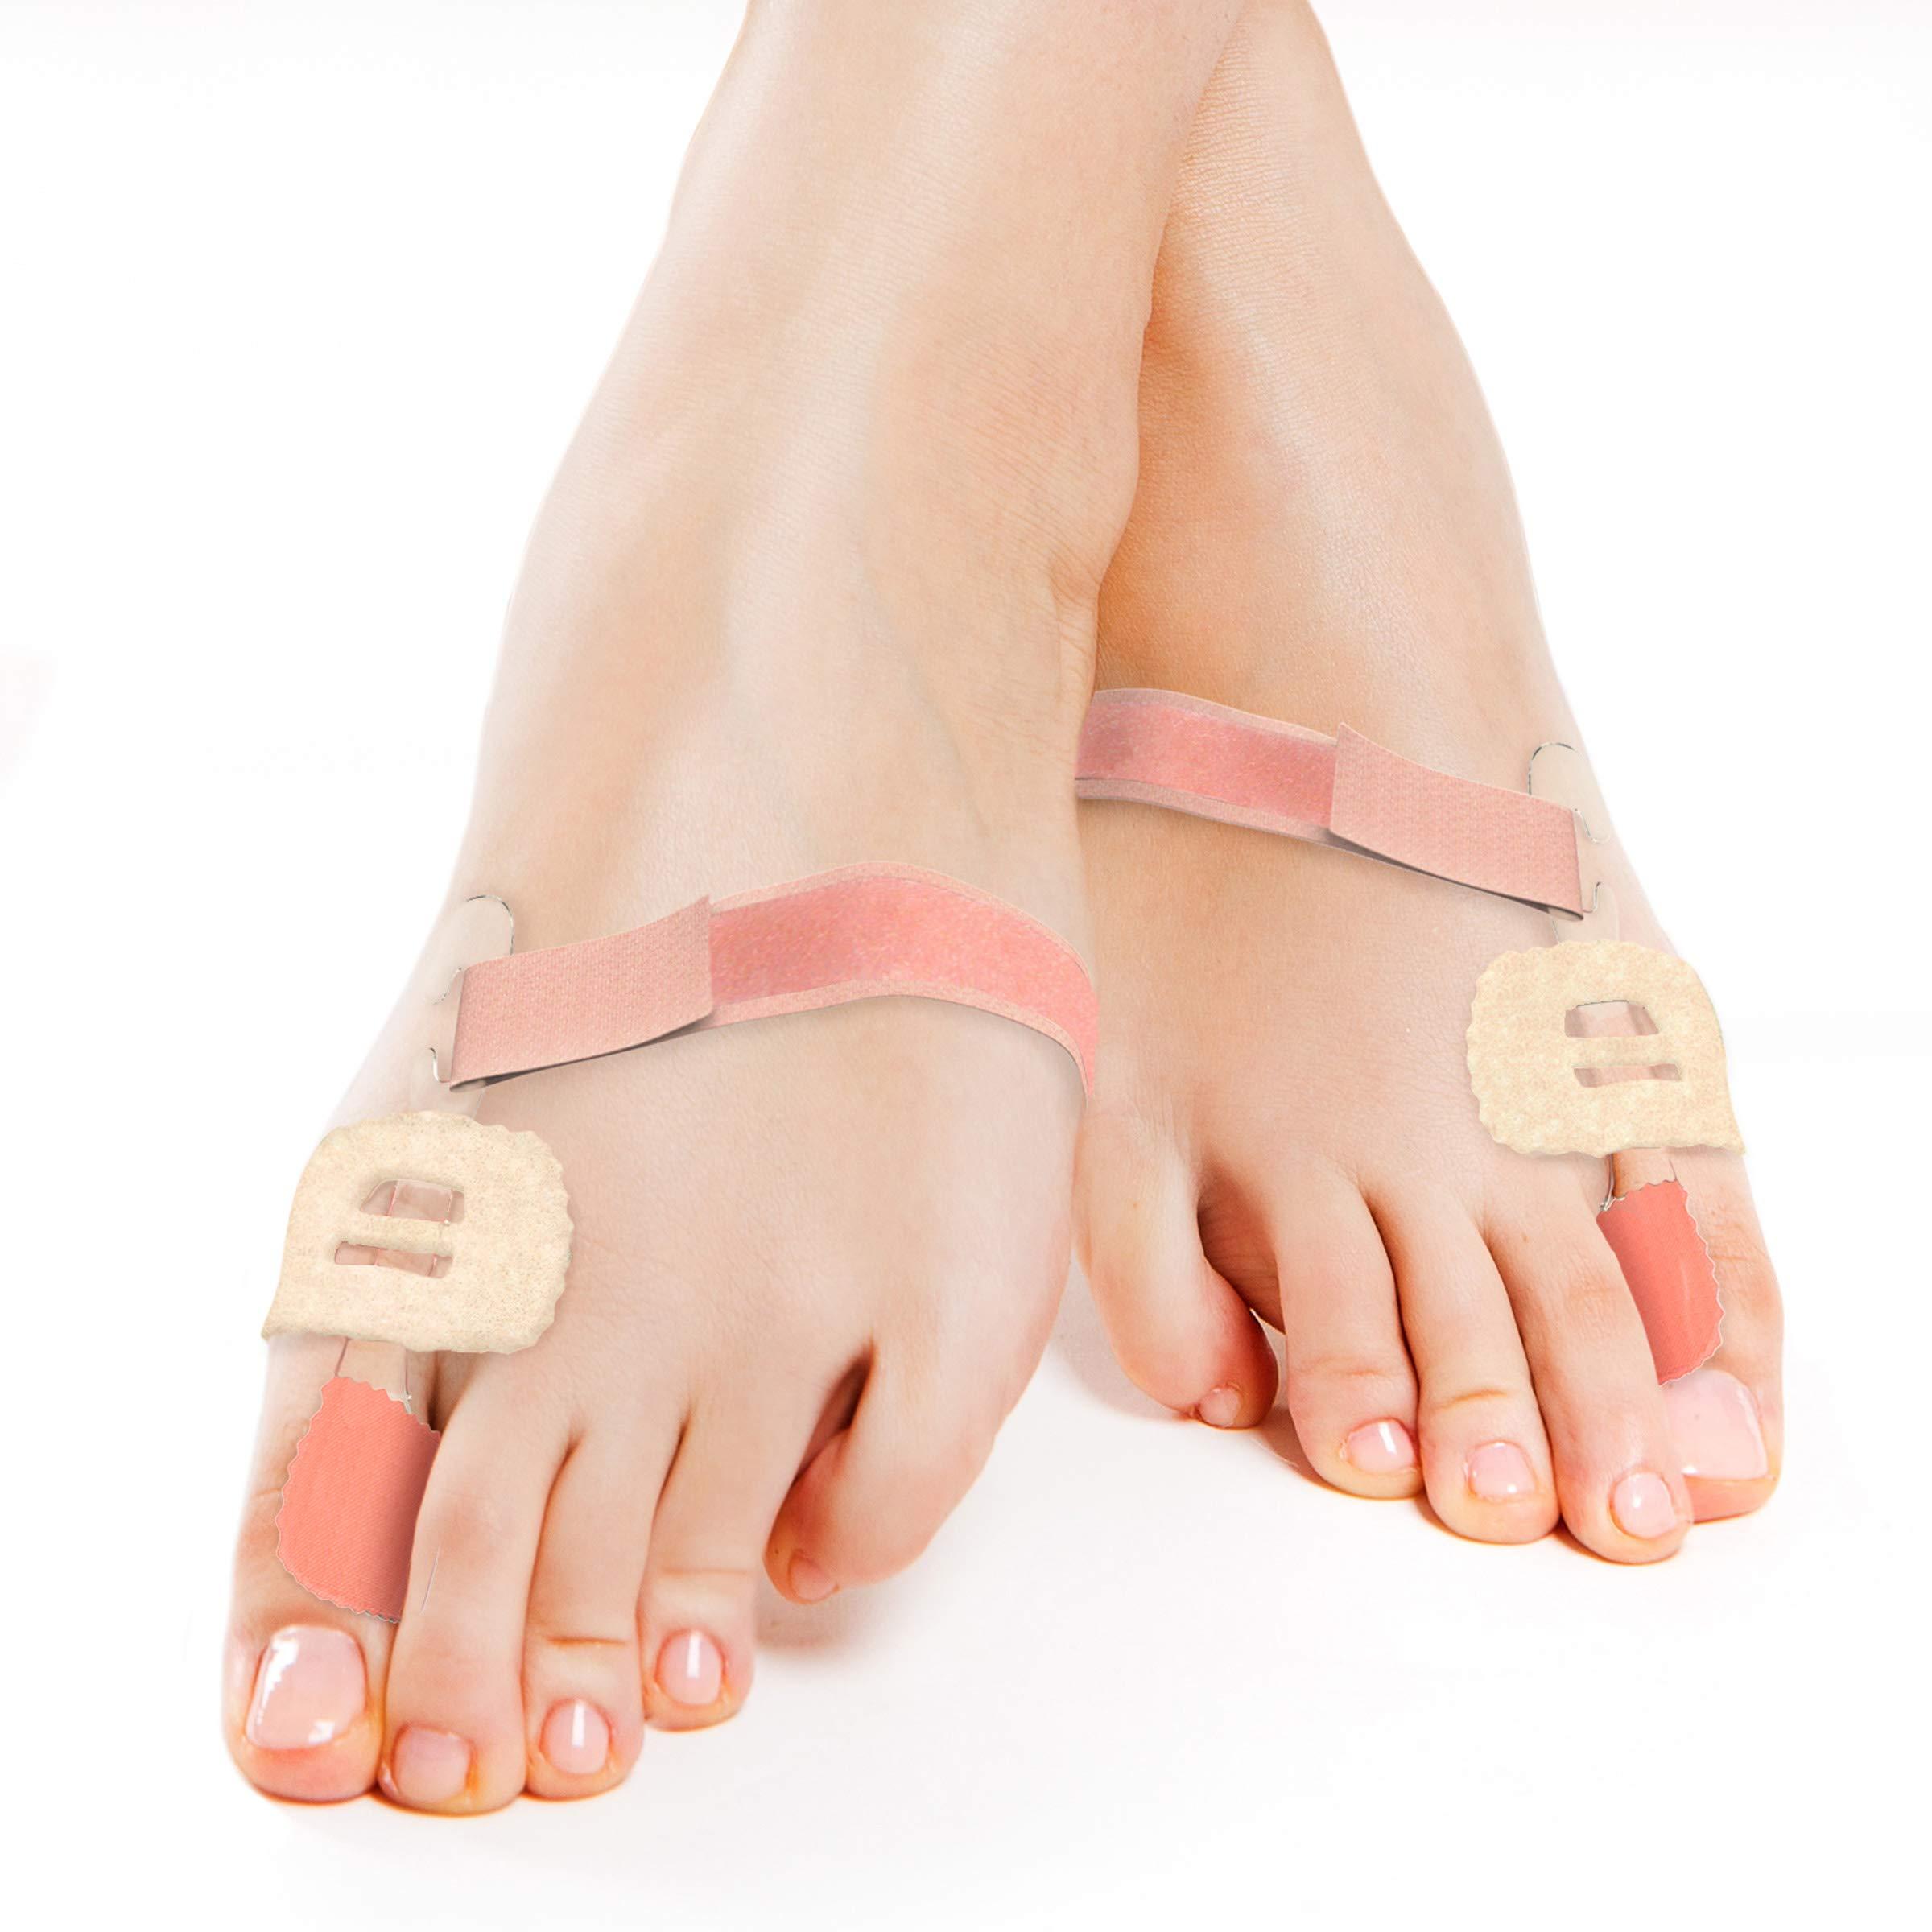 Bluestone Bunion Corrector Splint - Nighttime Pain-Relieving Orthopedic Toe Straightener Brace with EVA Foam Pad and Adjustable Strap (Set of 2) by Bluestone